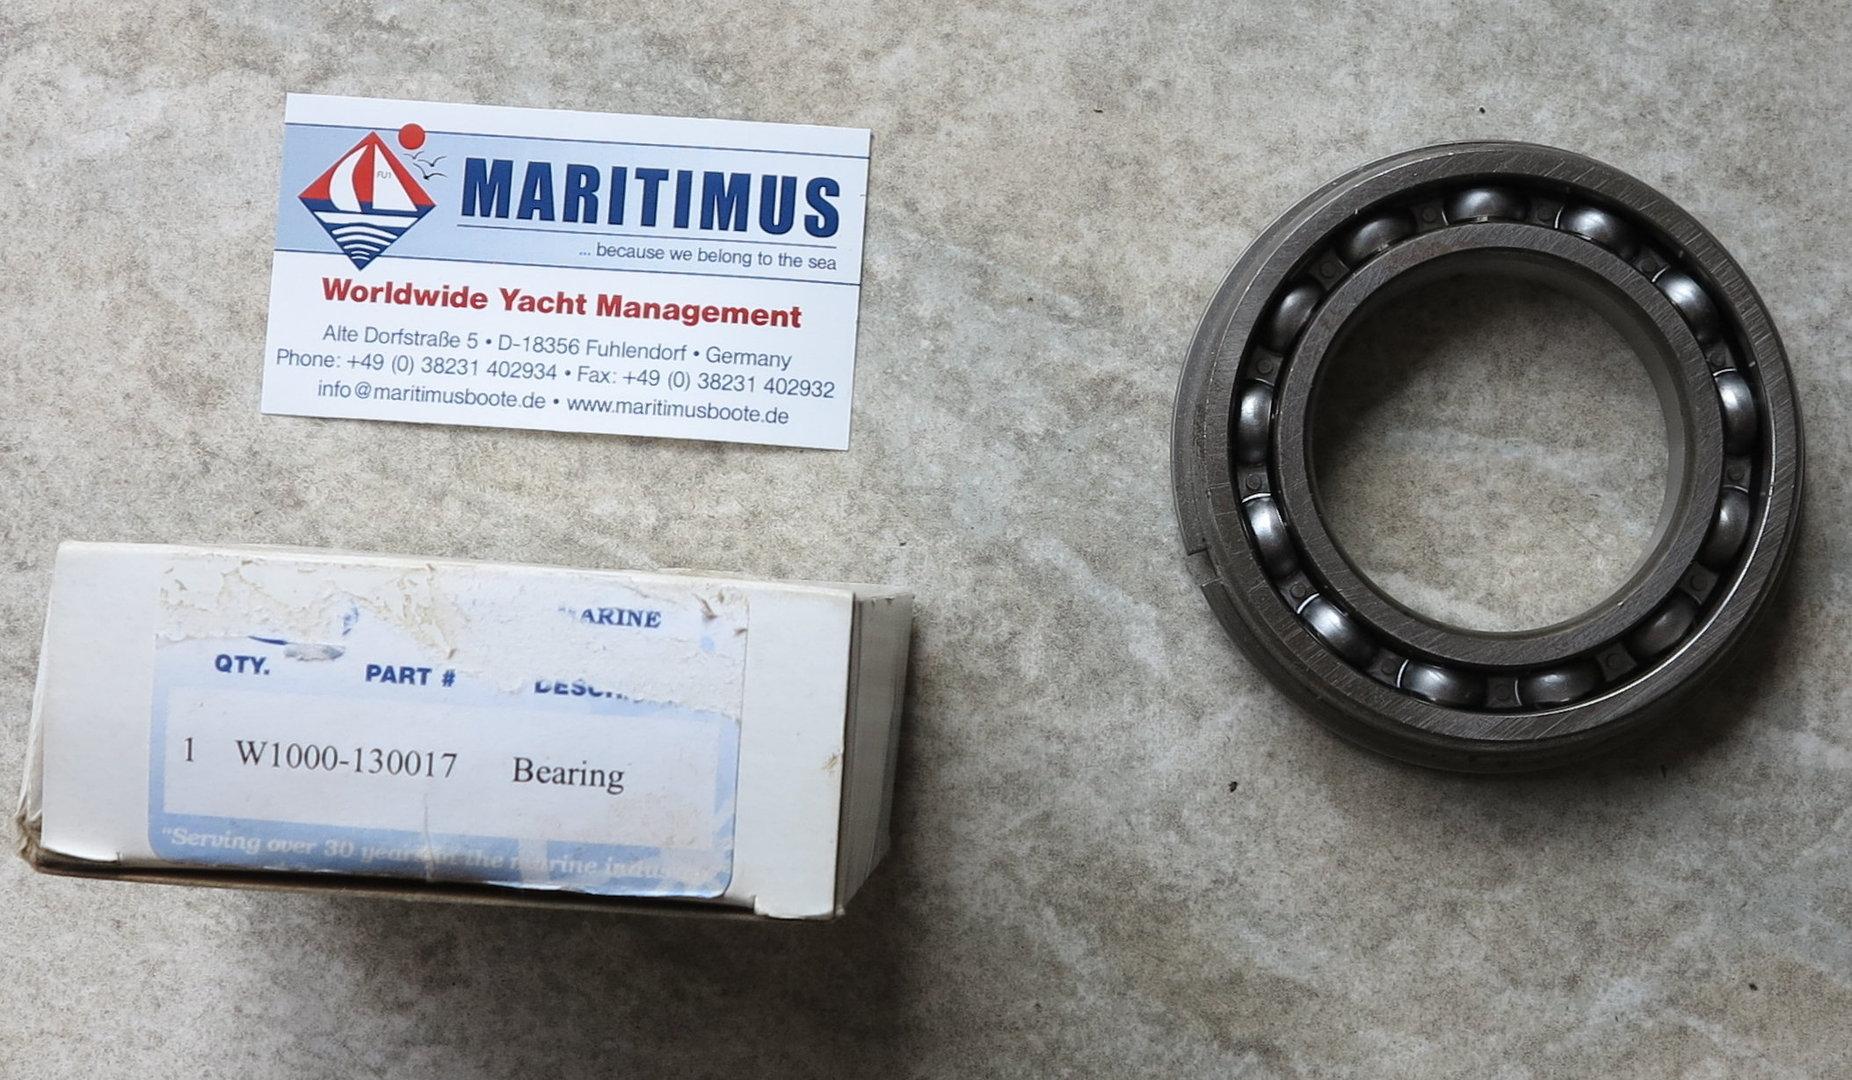 Borg Warner Velvet Drive 5C-67 Clutch Pressure Plate.